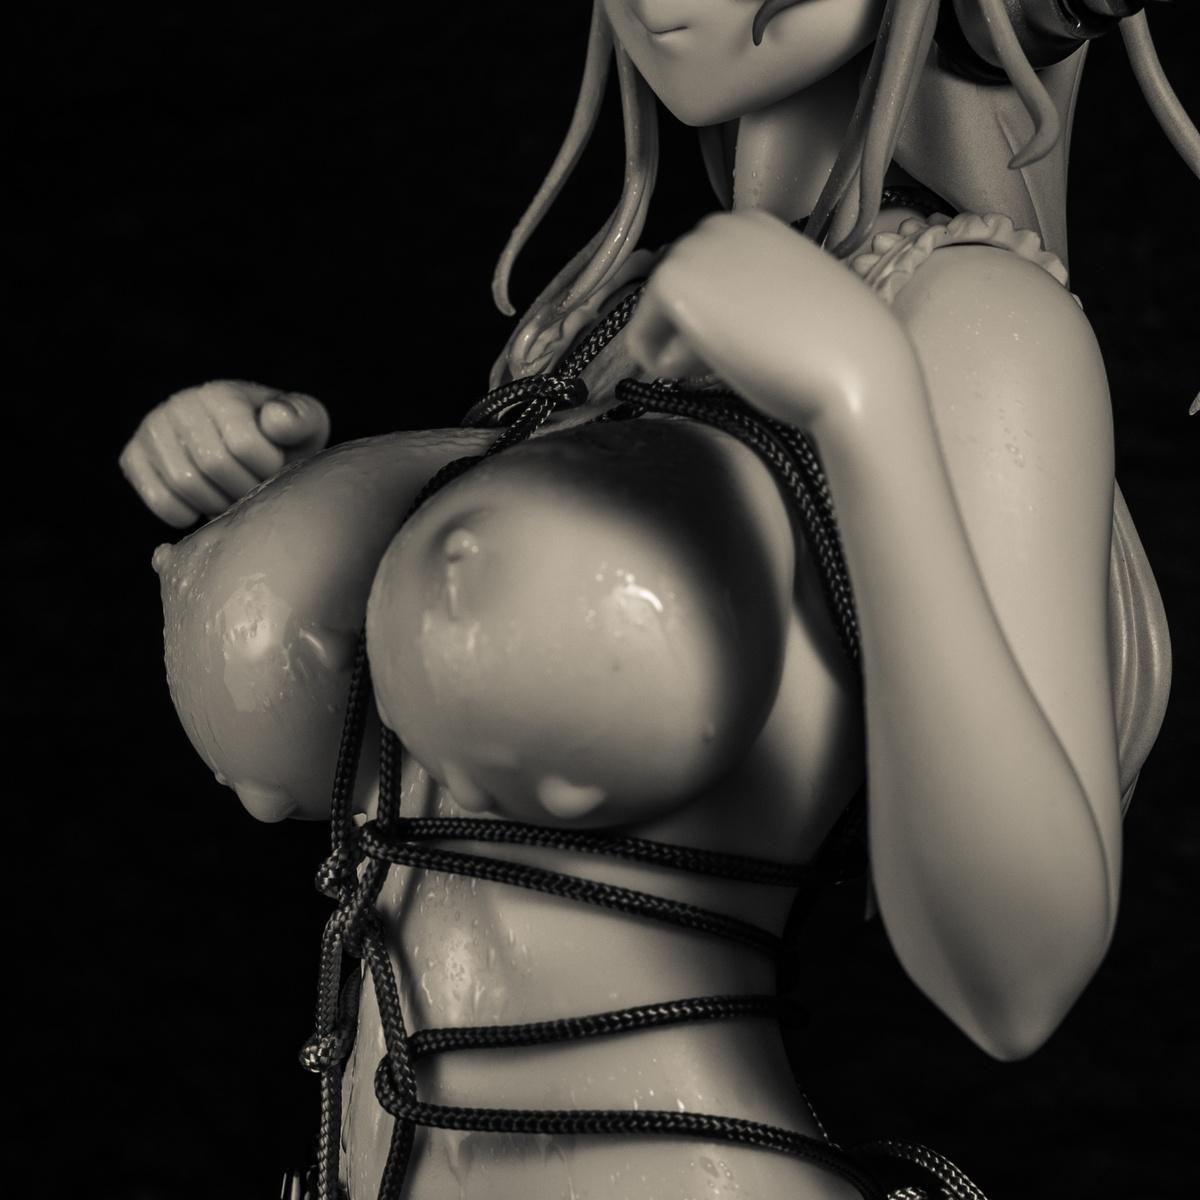 bondage milk freeing sonico nitroplus abe_masato nitro_super_sonic explosive_breasts tsuji_santa